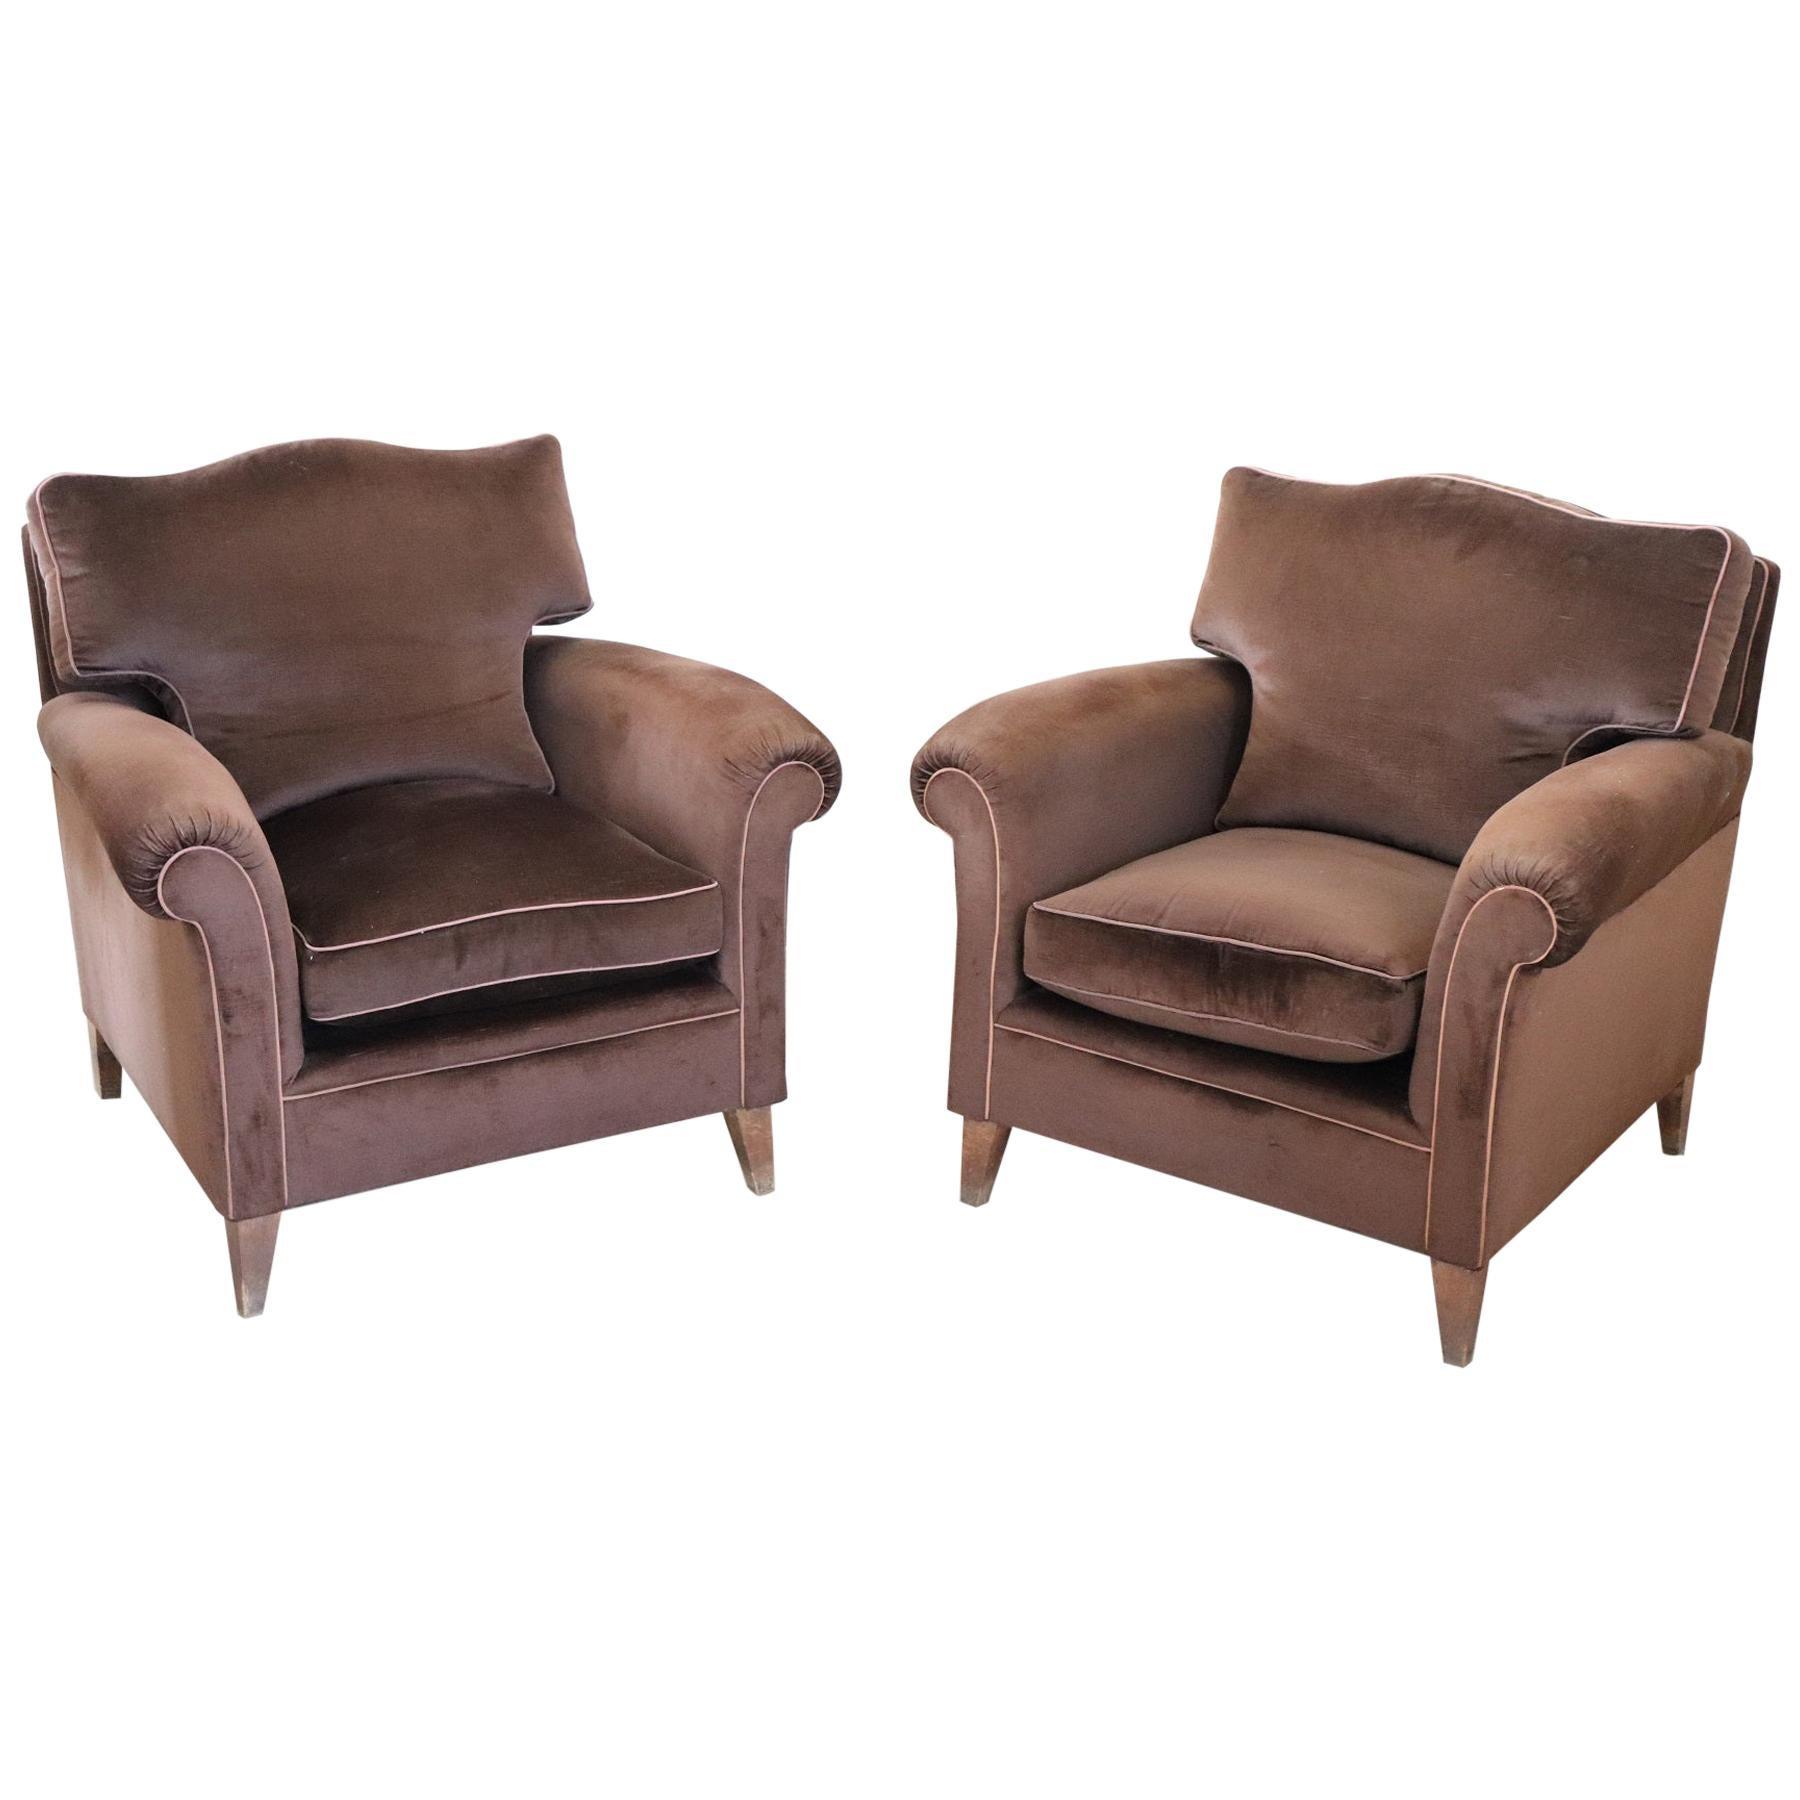 20th Century Italian Pair of Brown Velvet Armchairs, 1980s